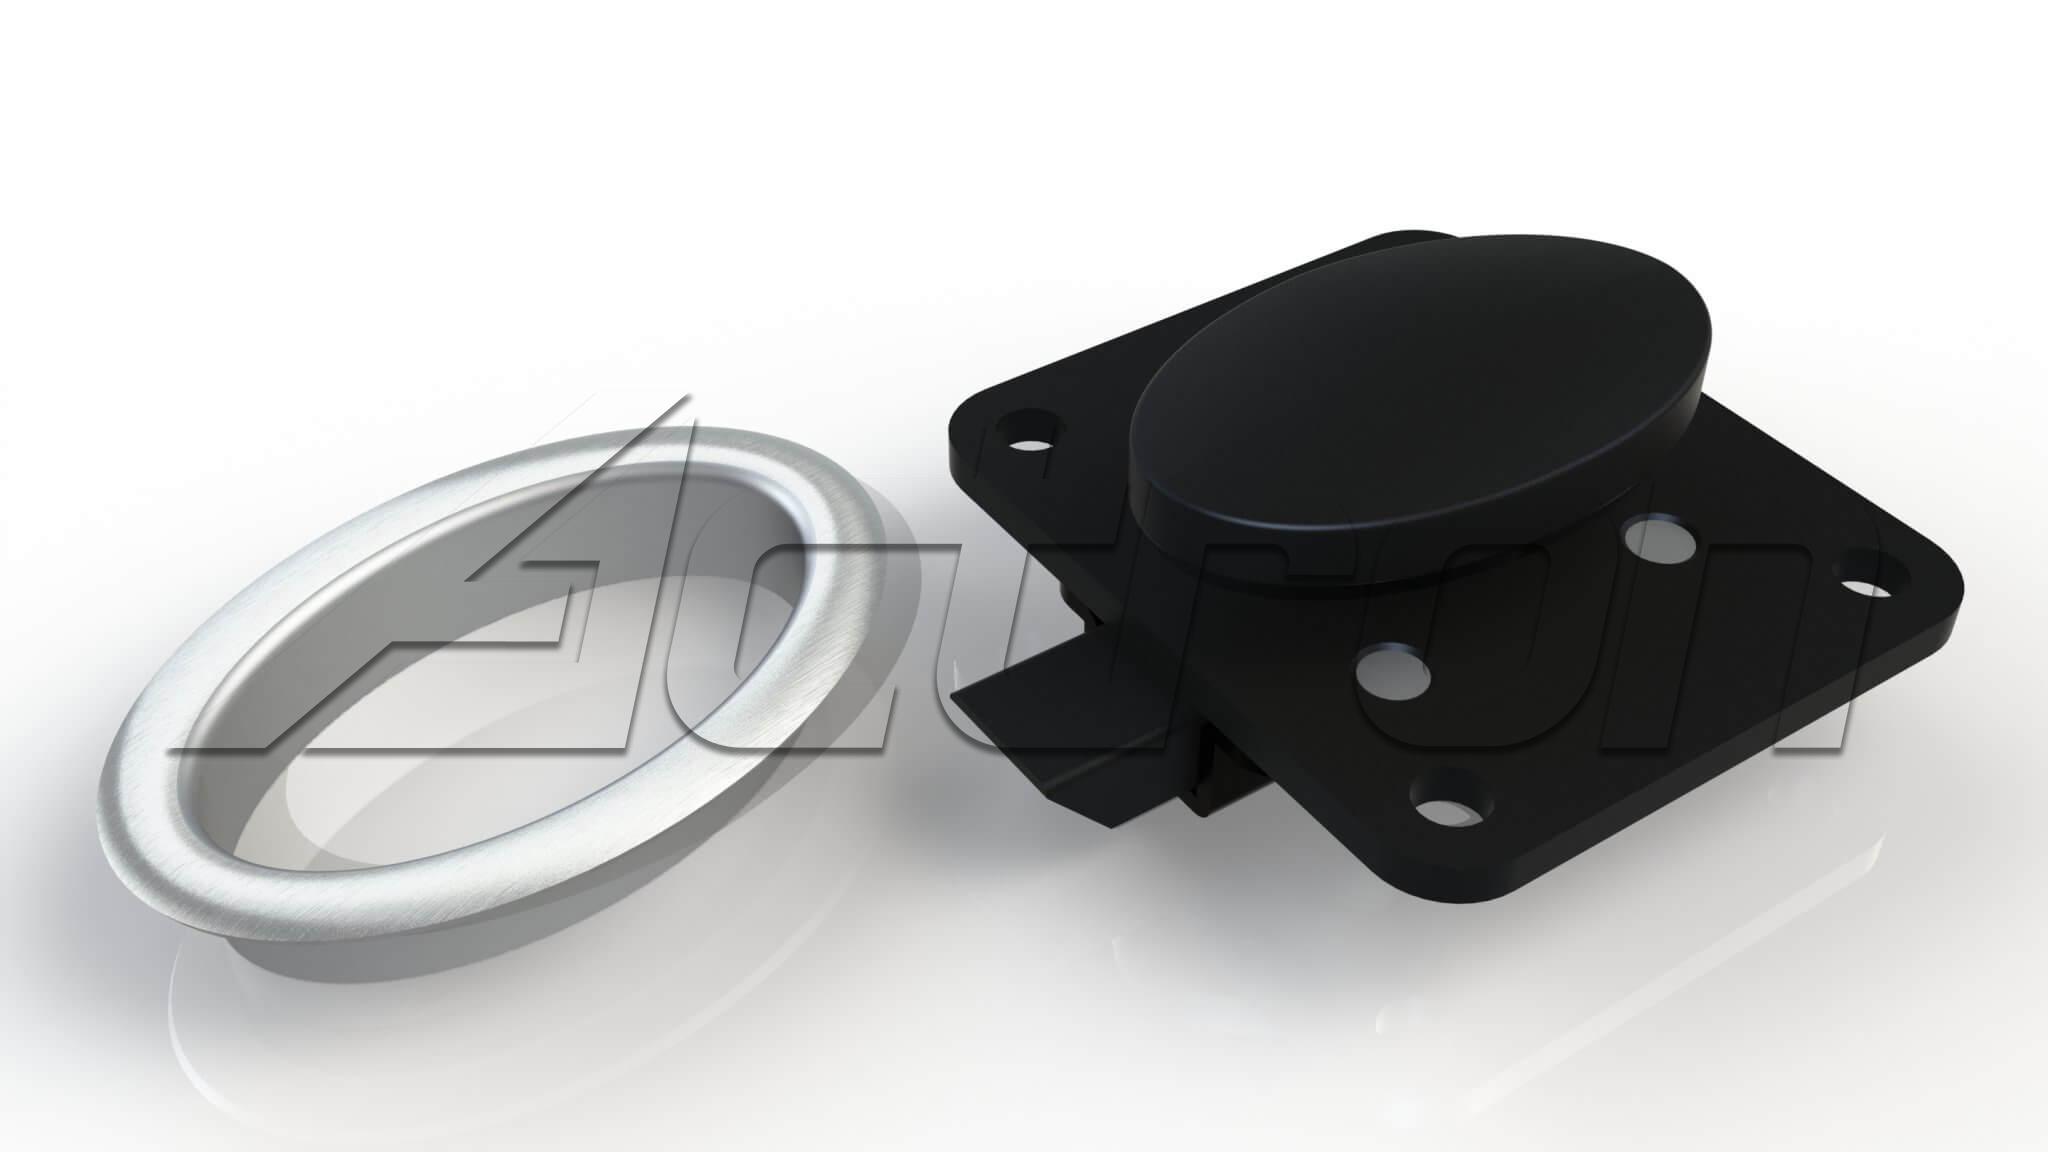 latch-assy-8211-push-button-3981-a30036.jpg